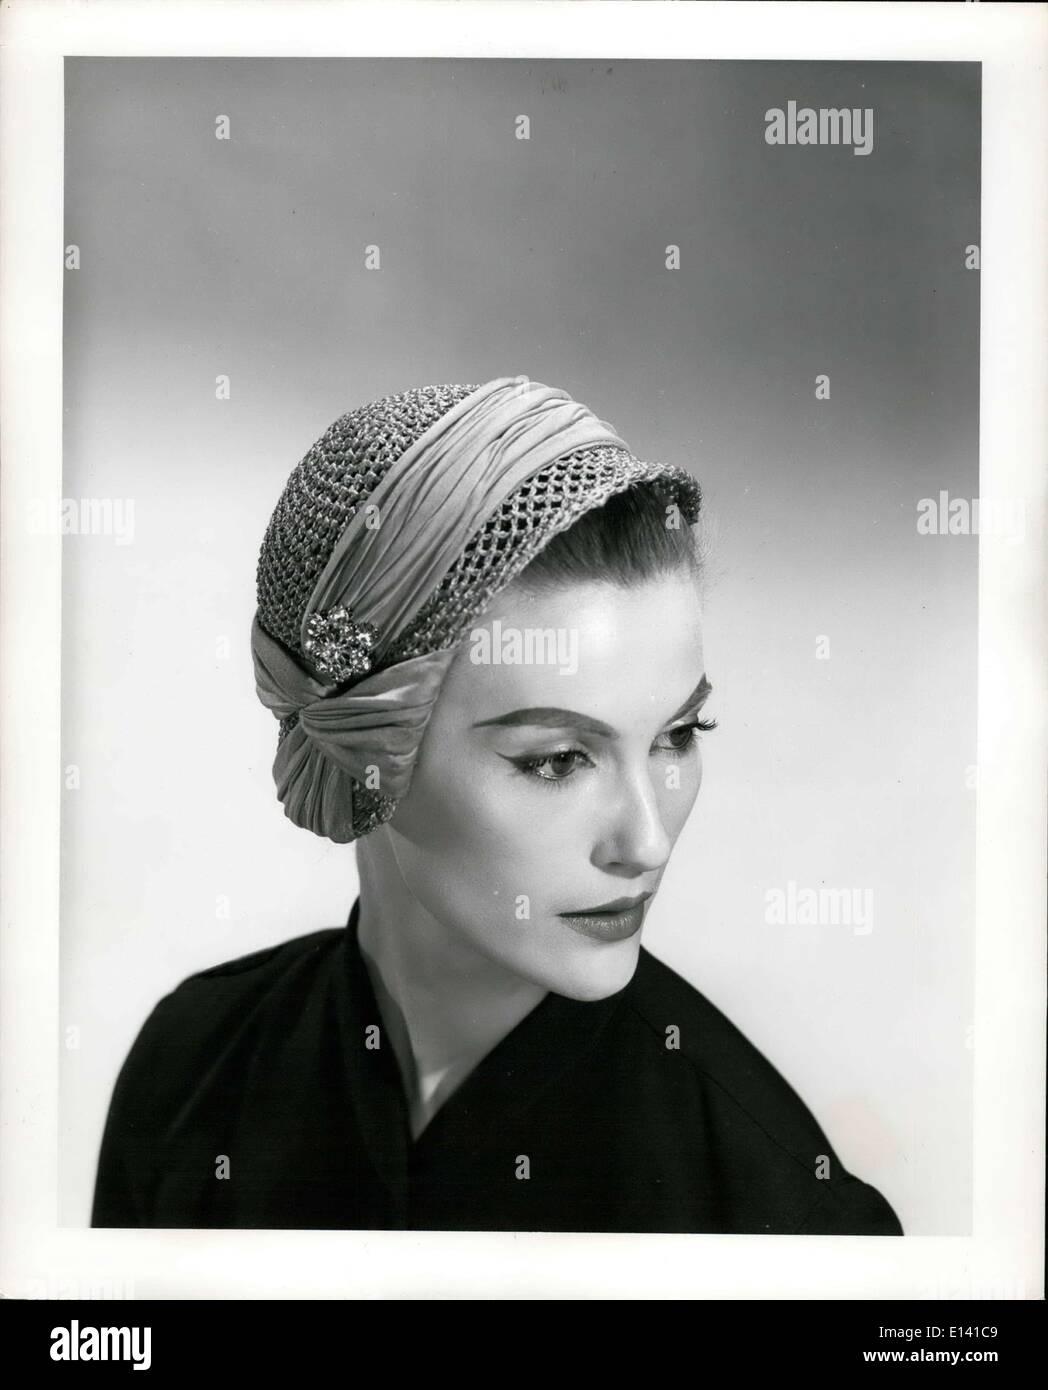 Mar. 31, 2012 - John Frederics Cloche hat 1954 - Stock Image